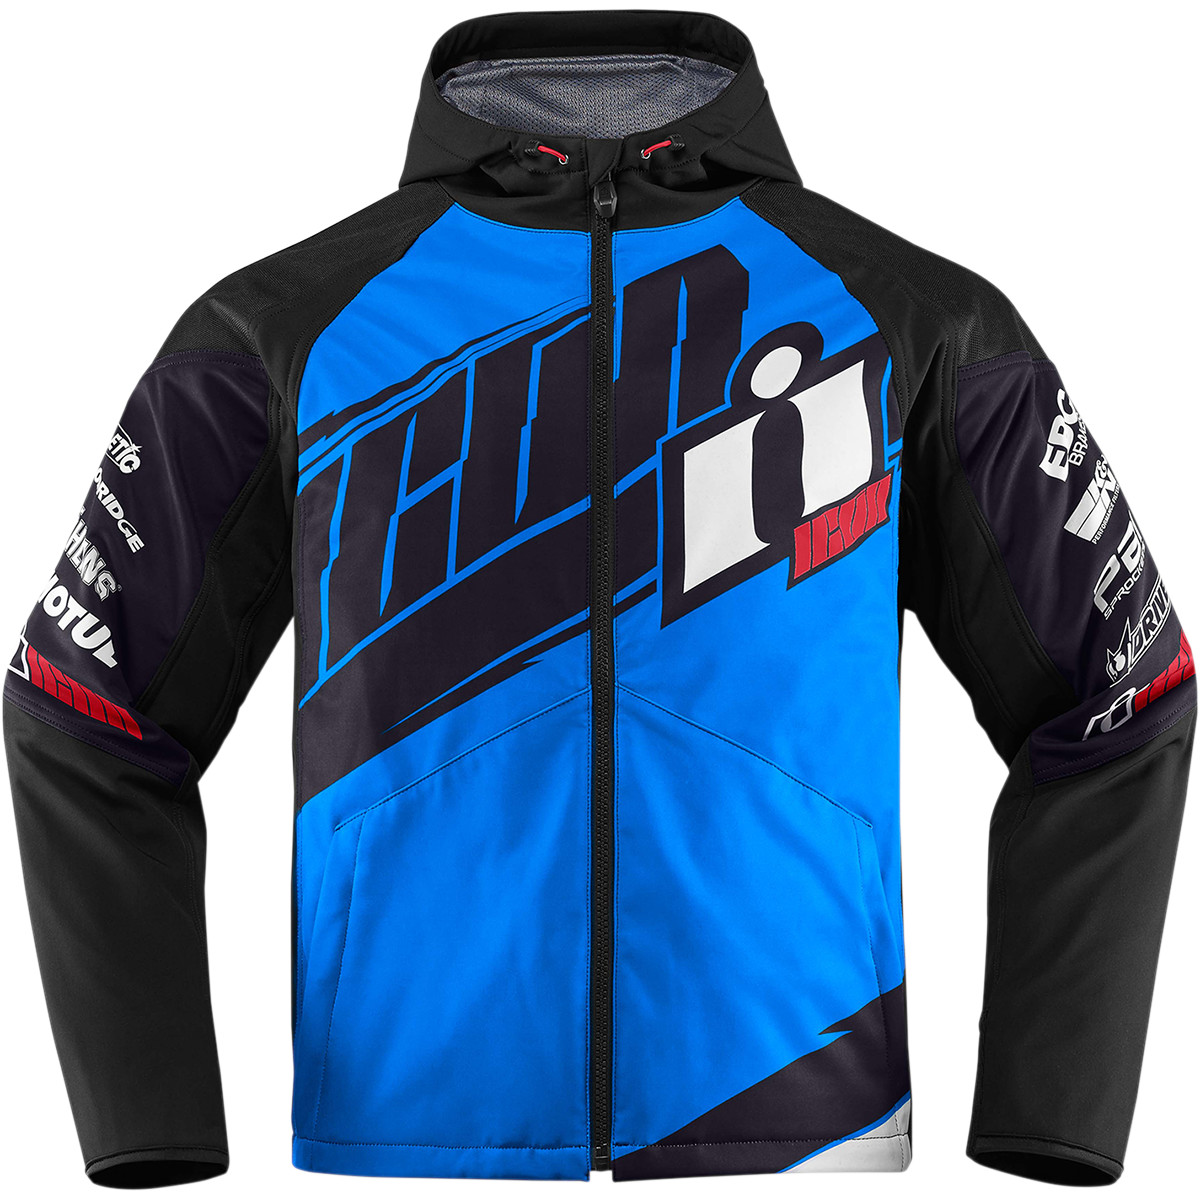 ICON Team Jacket Sport-Riding (Multi Blue, USA SIZE 2X-Large)